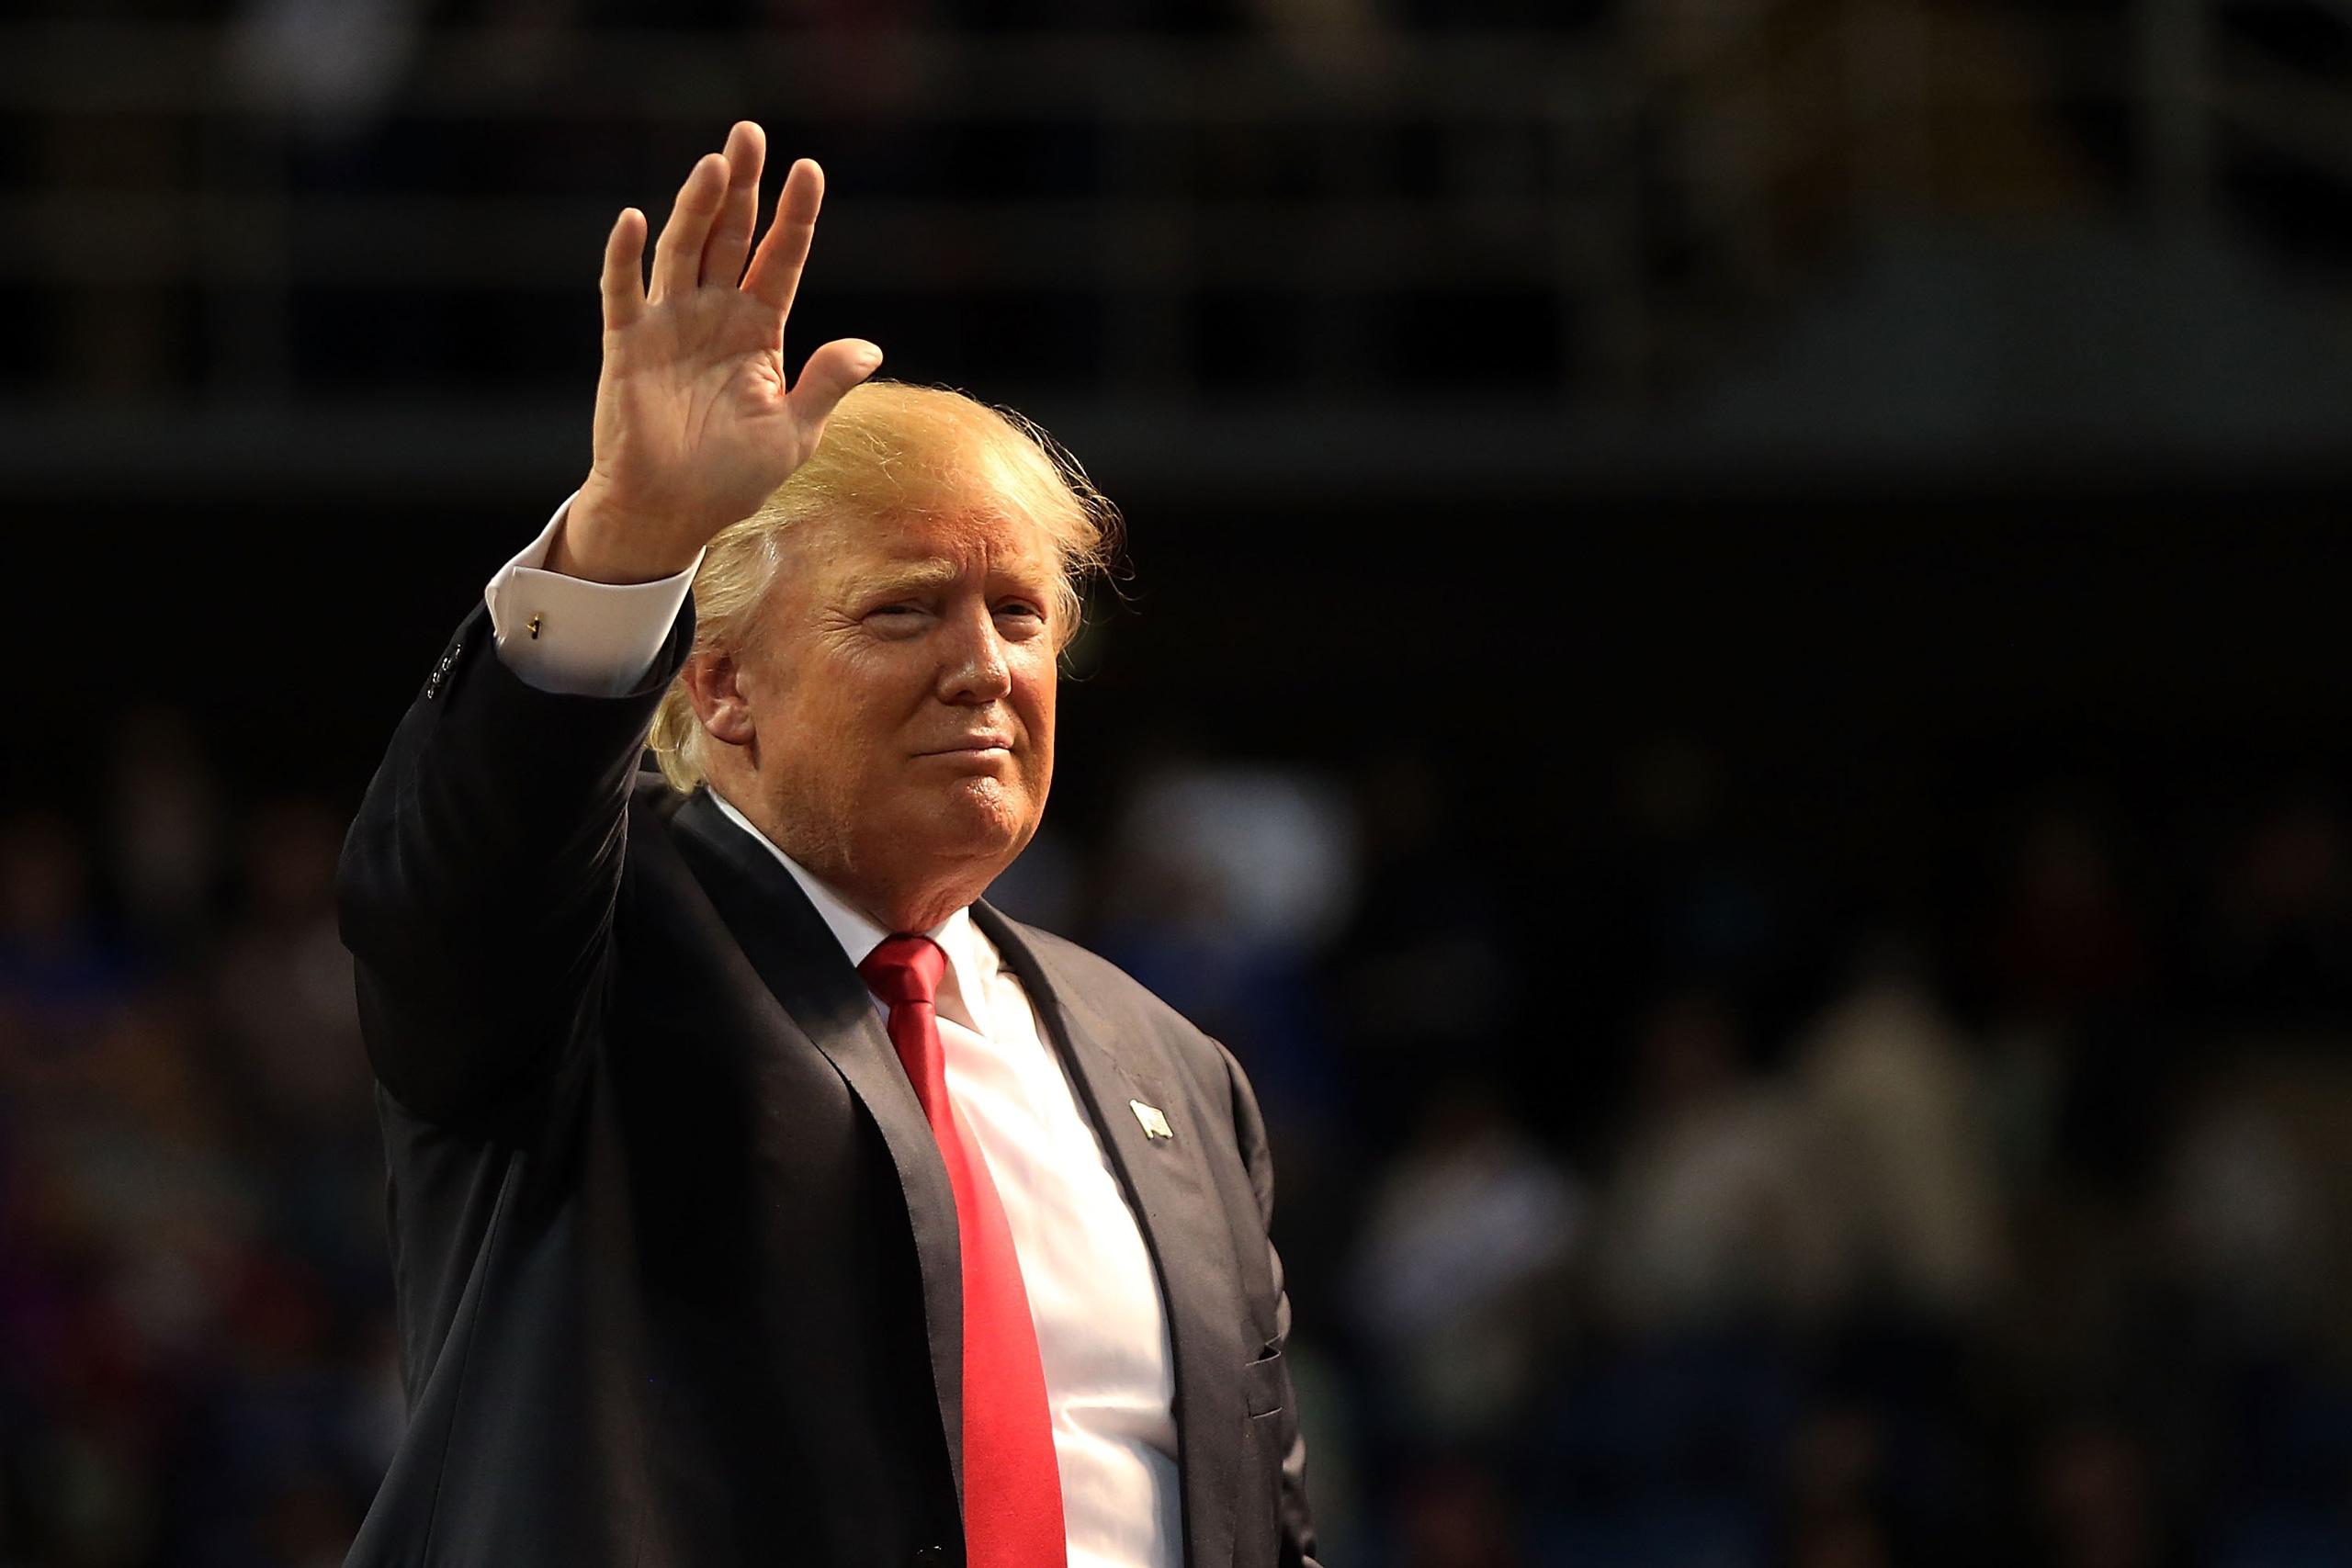 Donald Trump speaks at the Mississippi Coast Coliseum in Biloxi, Mississippi, on Jan.2, 2016.